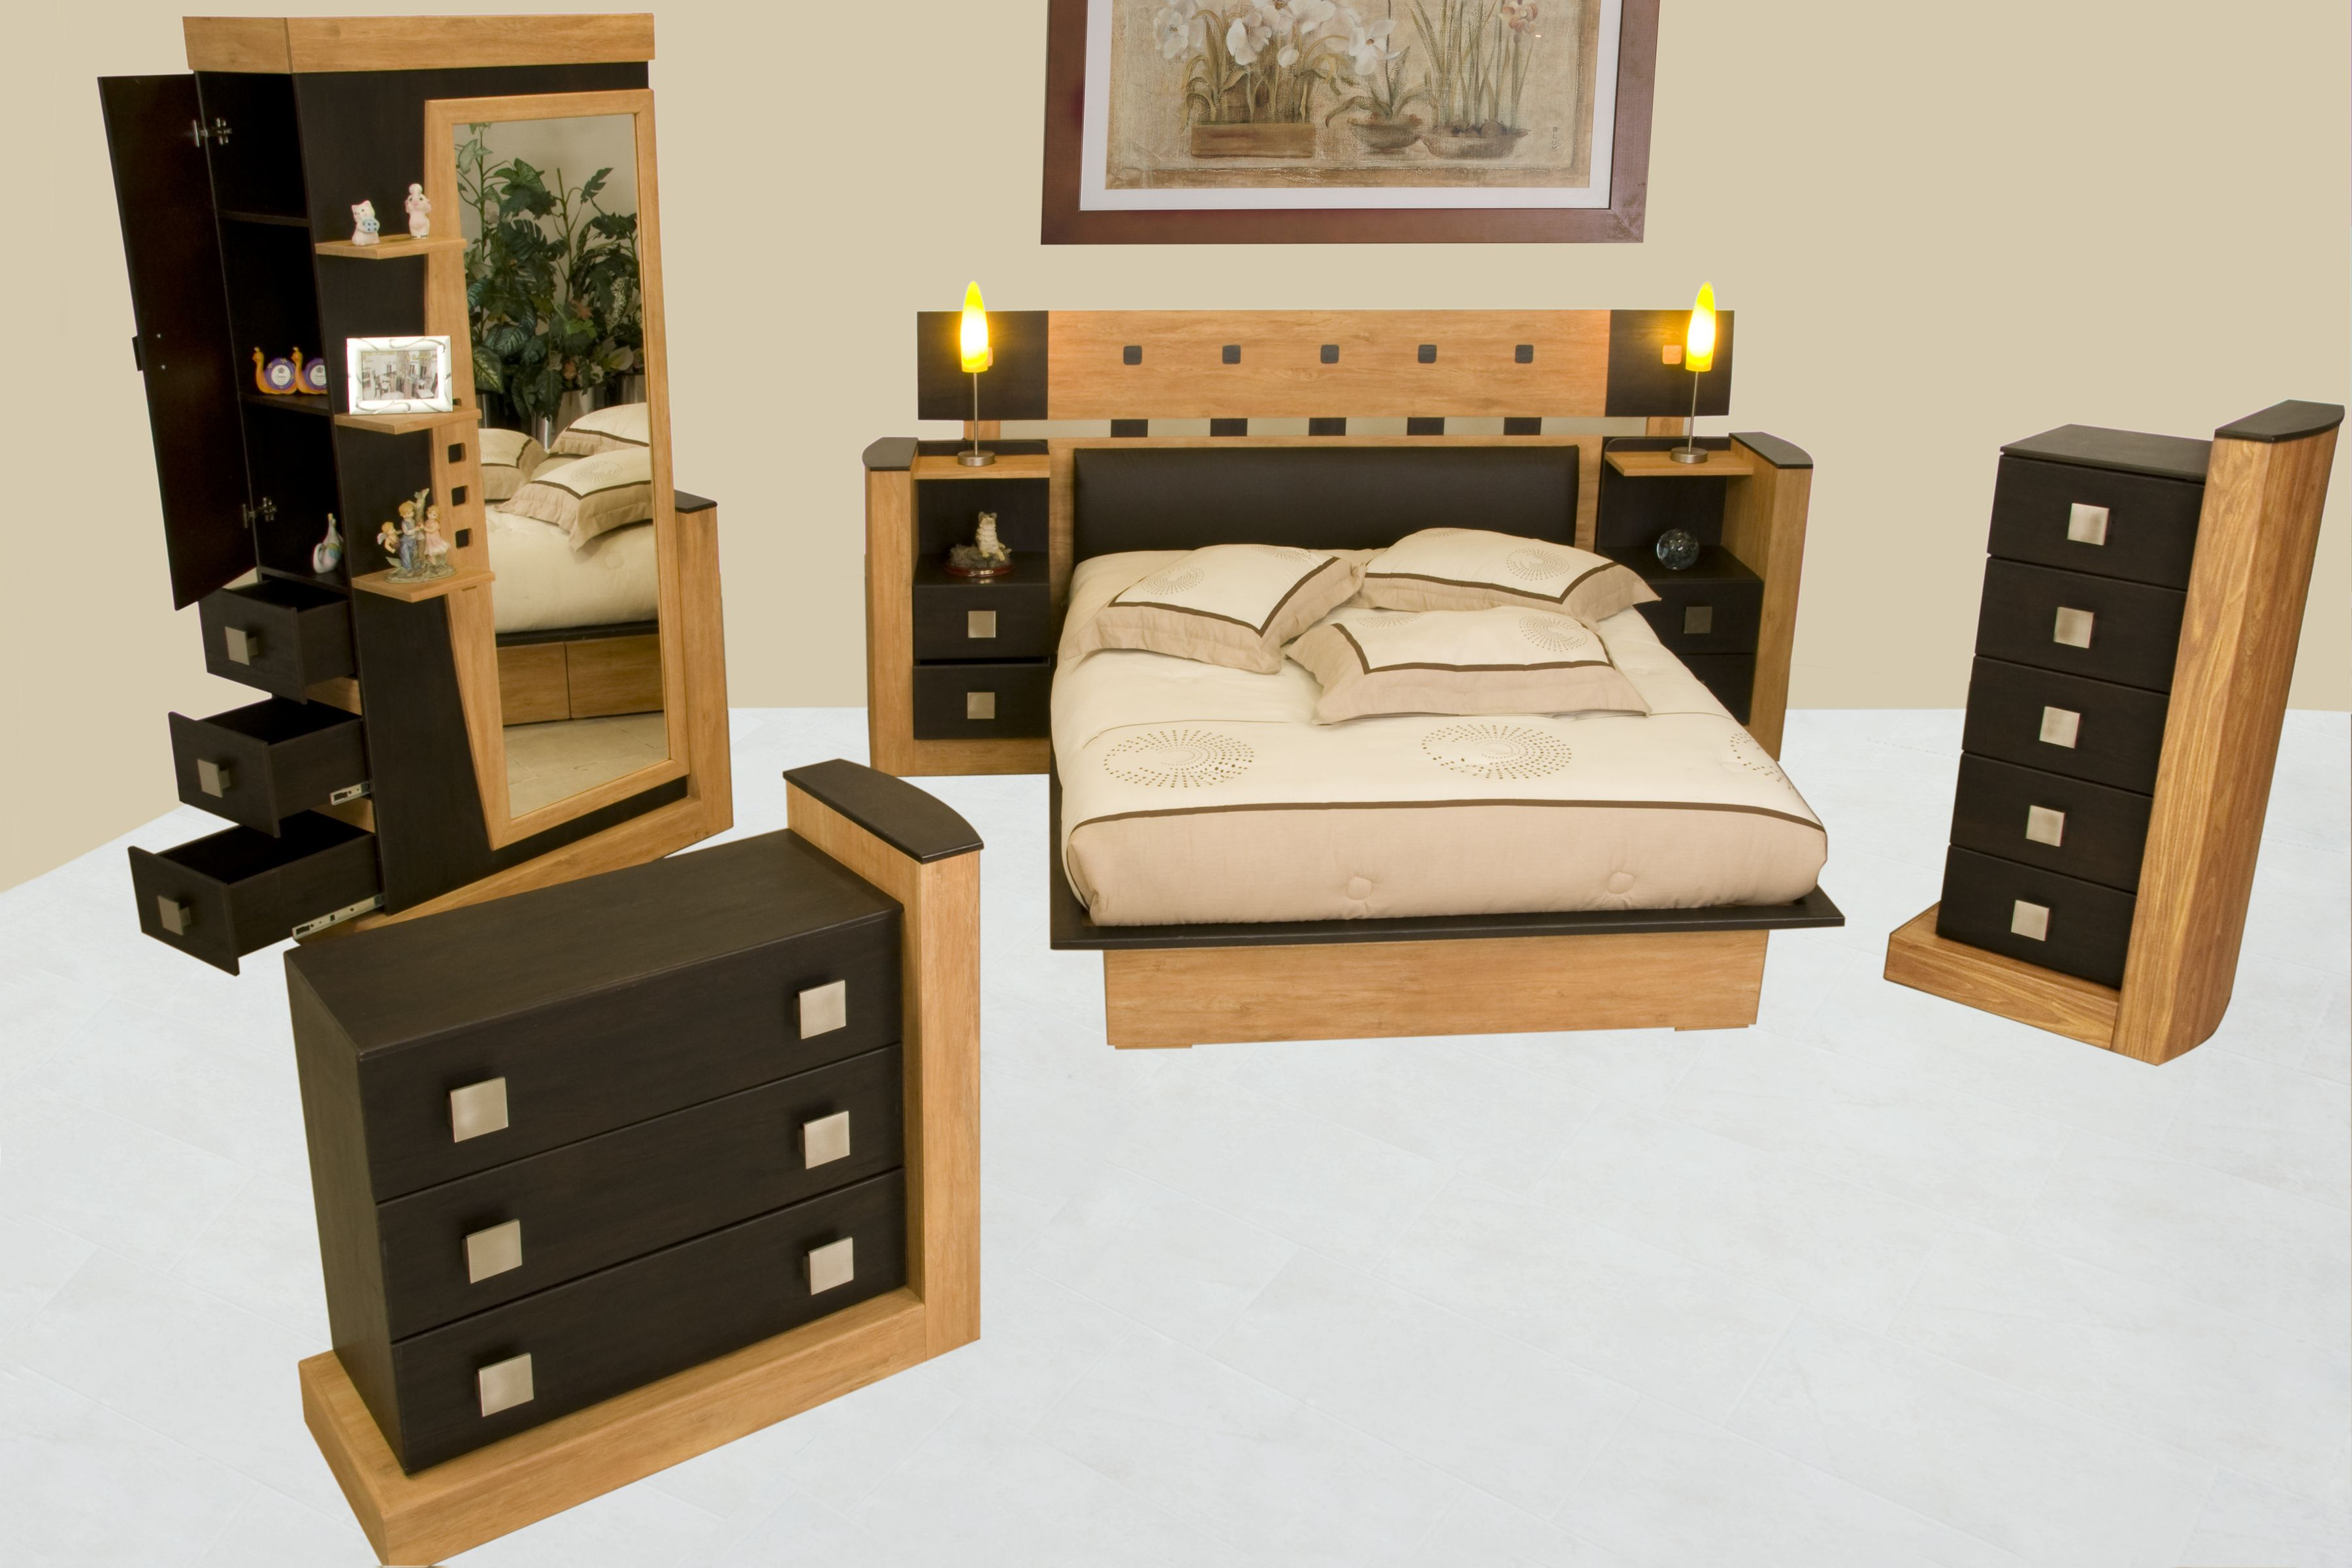 Recamara 4 pzas kenia muebles troncosomuebles troncoso - Muebles troncoso recamaras ...